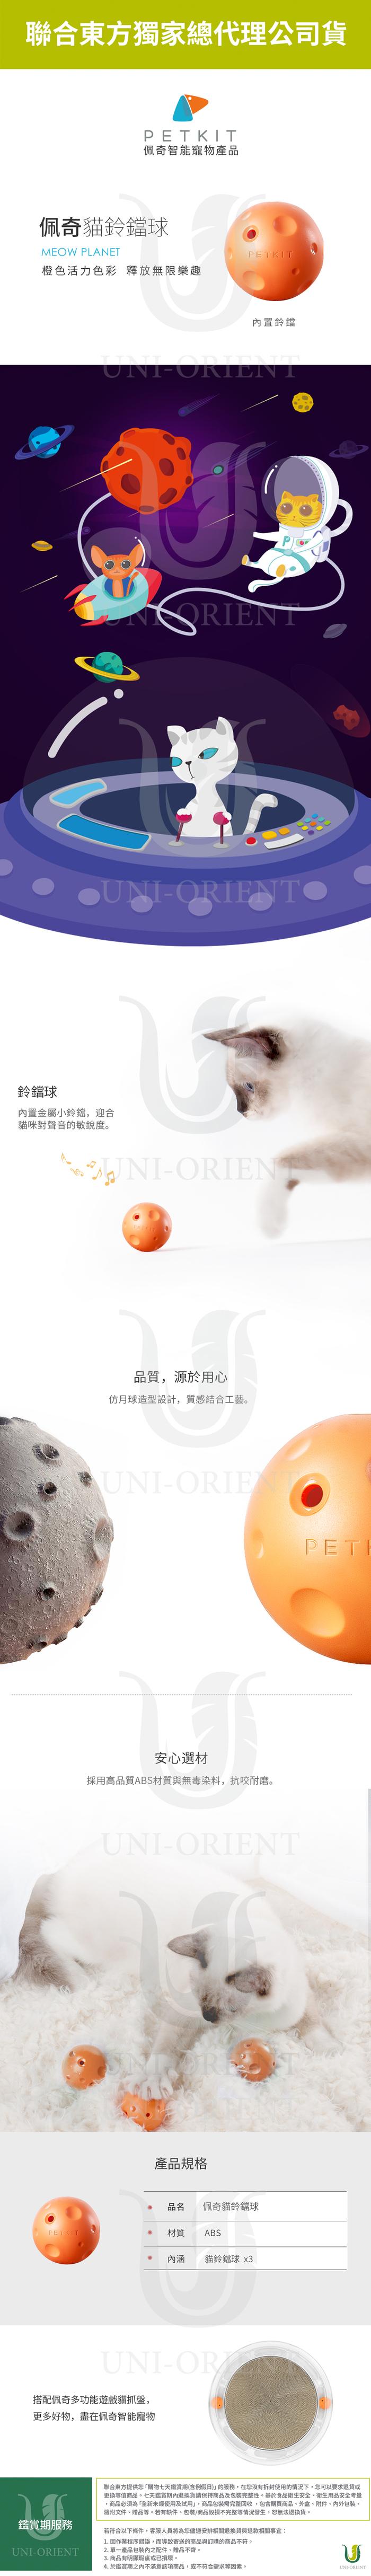 PETKIT佩奇|貓鈴鐺球/3入裝